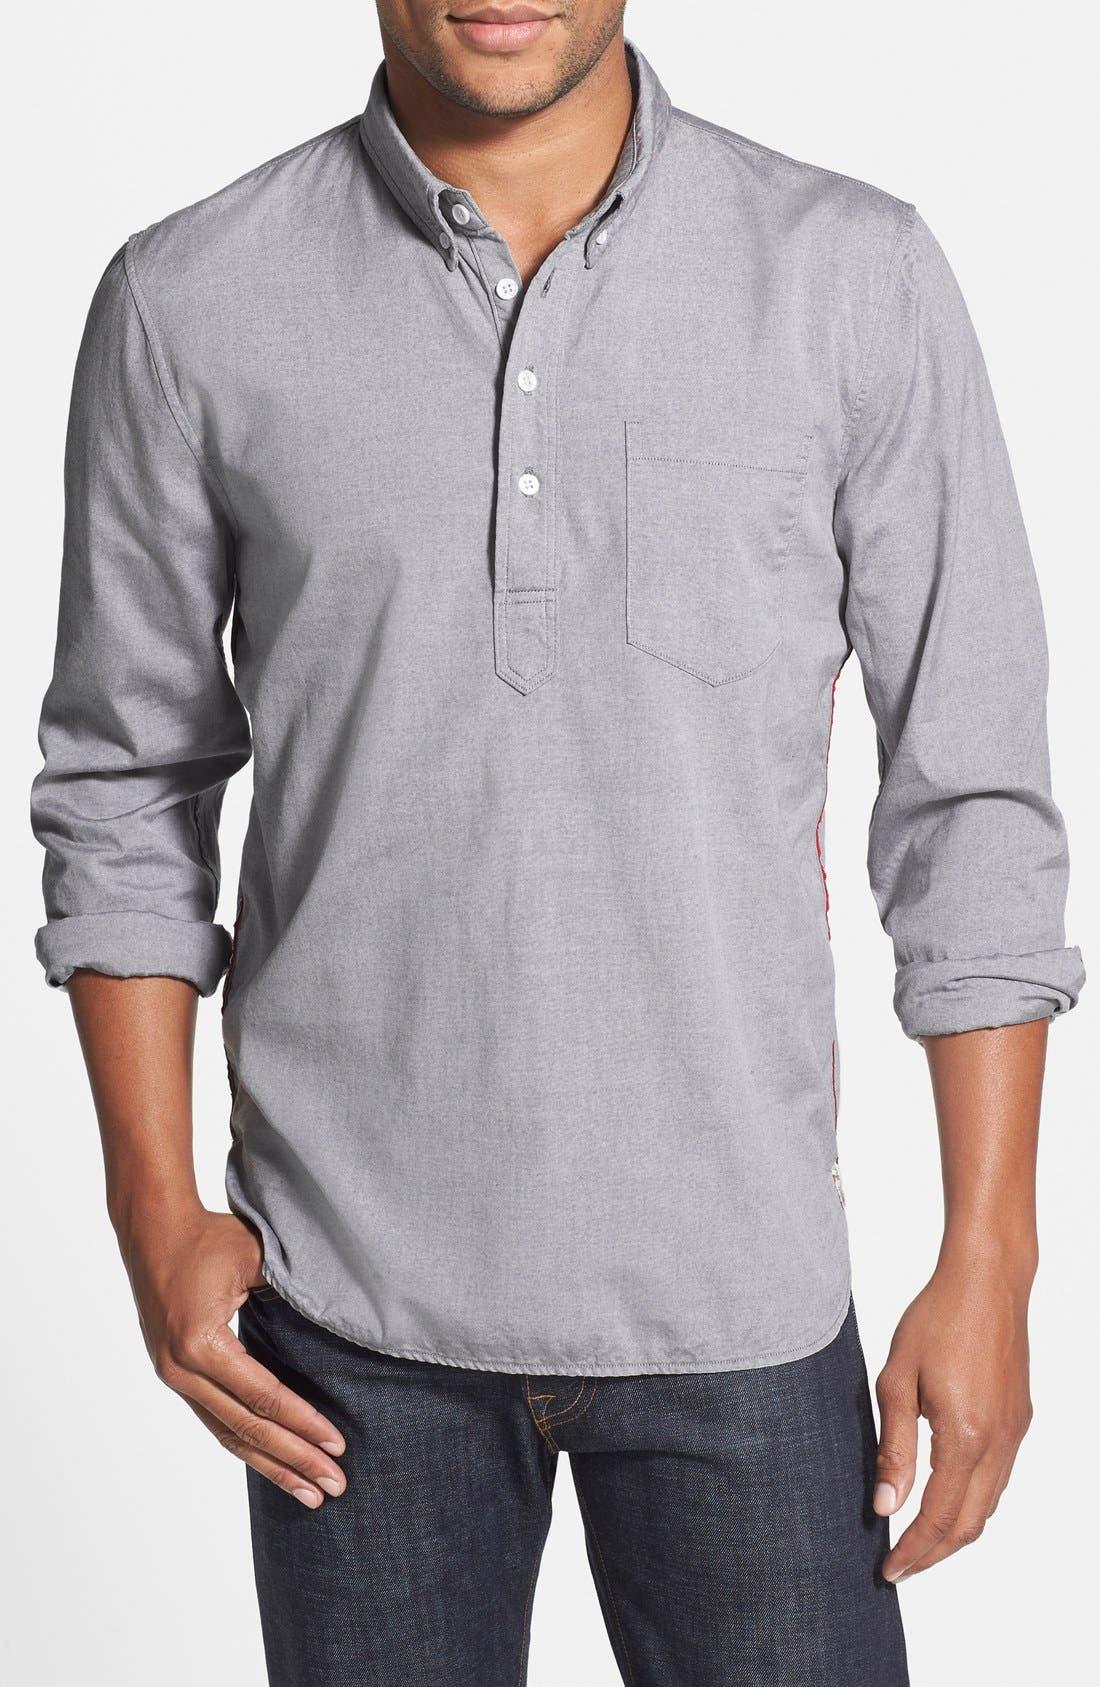 M.Nii 'Senator' Oxford Pullover Shirt | Nordstrom